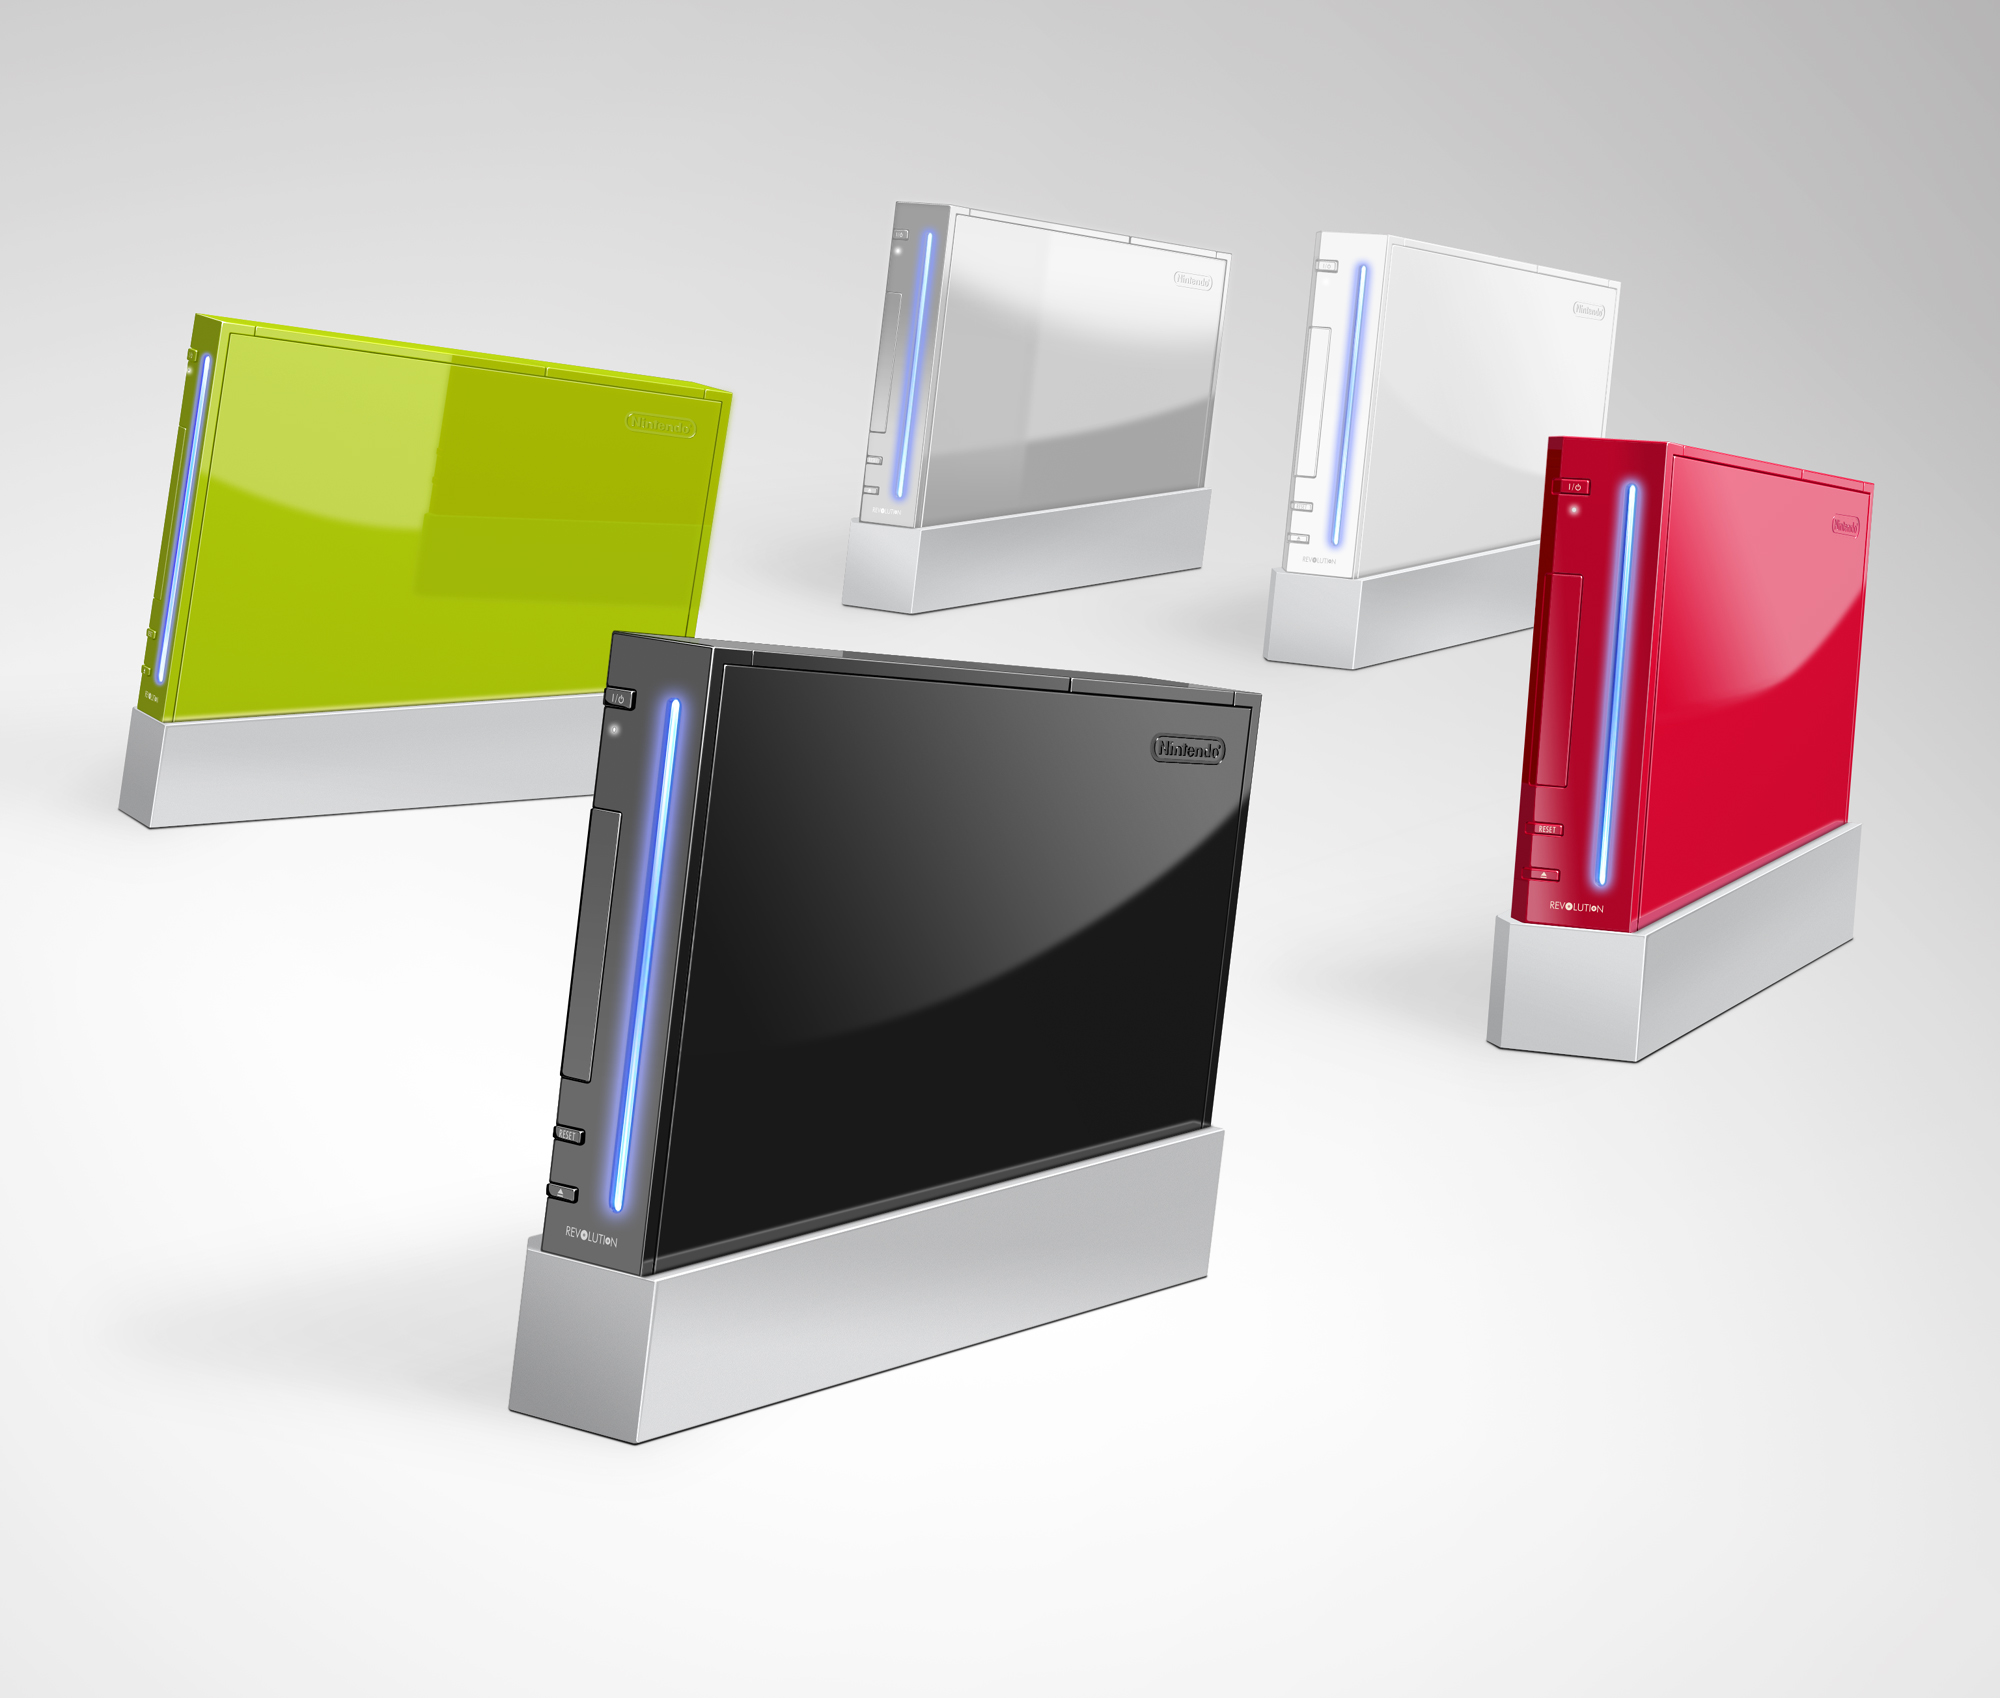 Nintendo Wii: Nintendo Teases More New Wii Hardware